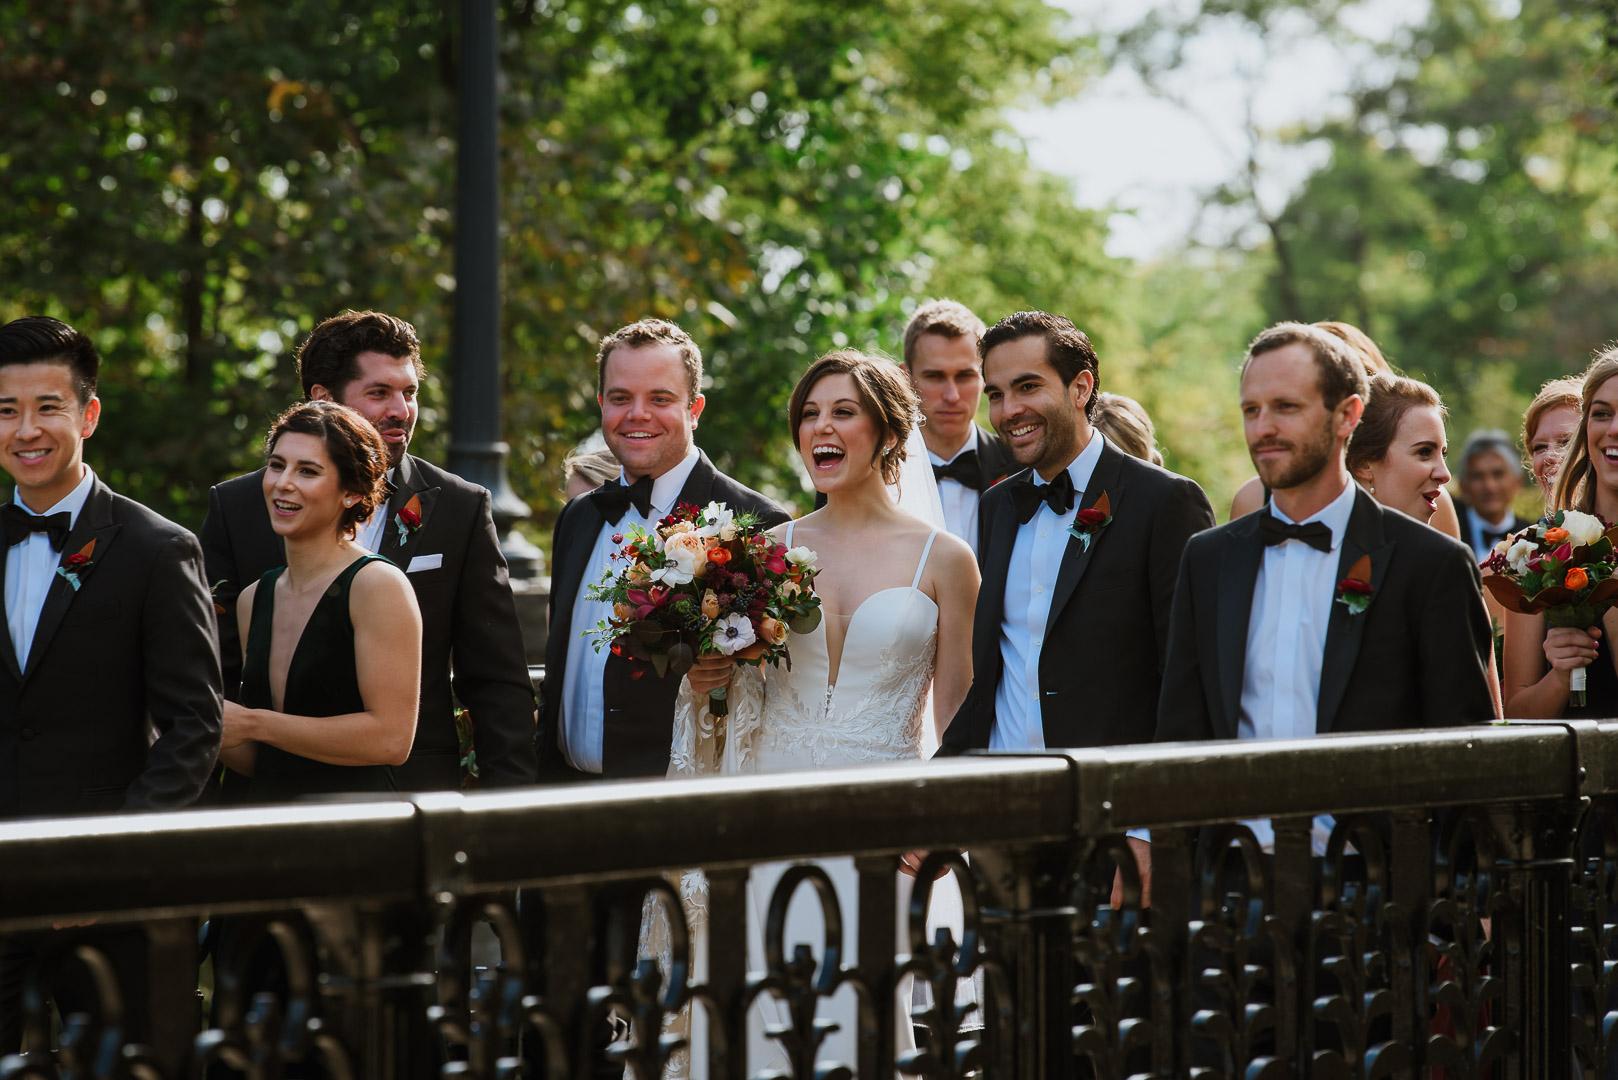 milwaukee-wedding-photographer-wisconsin (1 of 1)